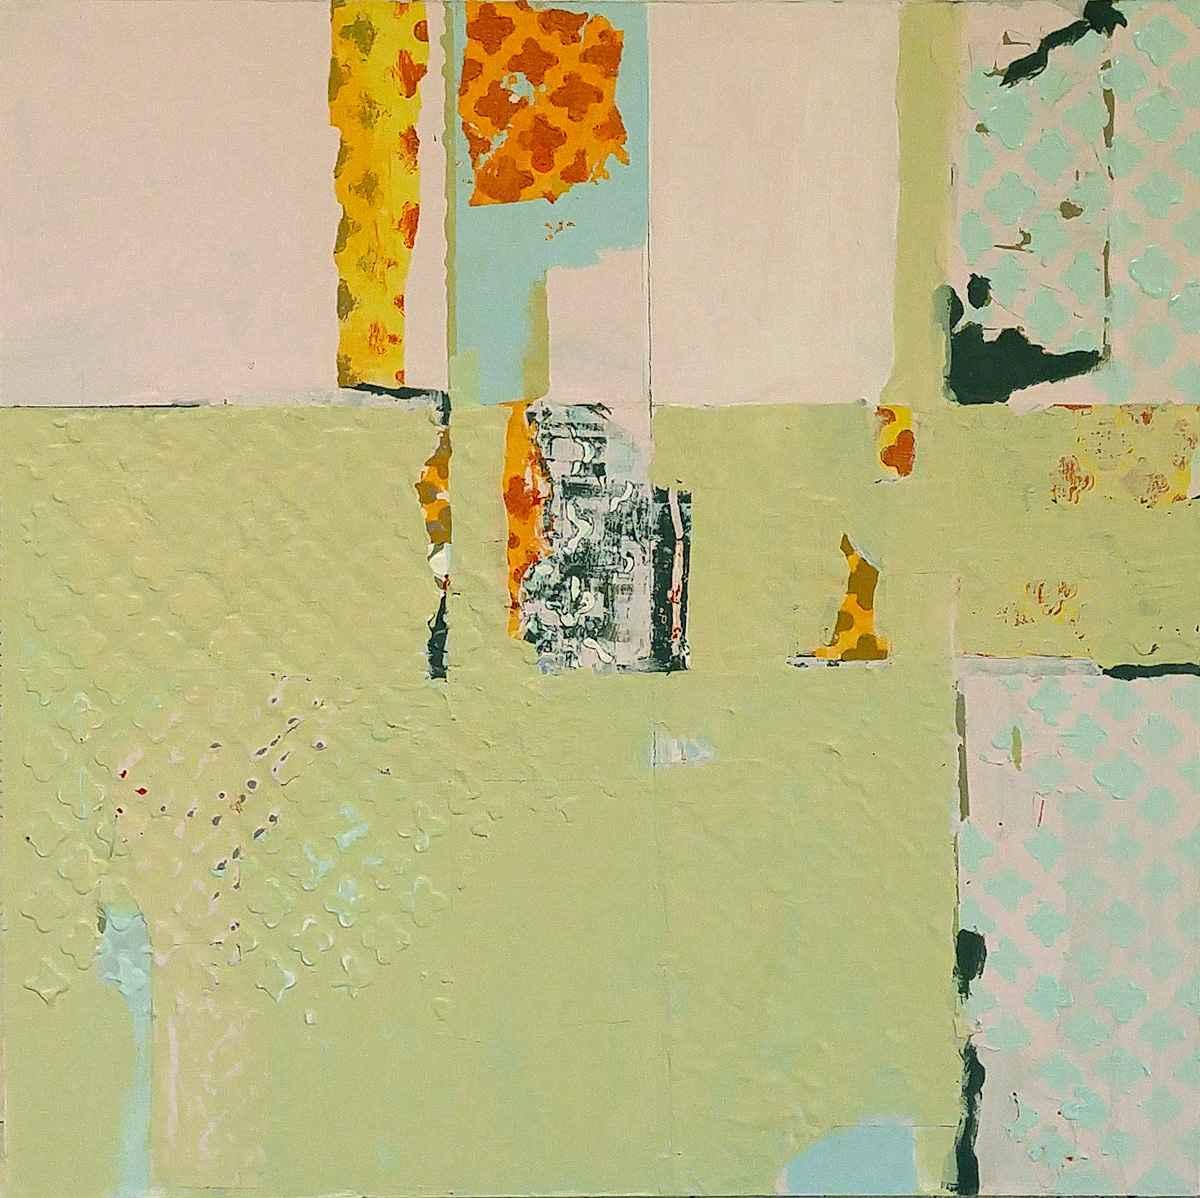 Small Moments II by  John Fatica - Masterpiece Online